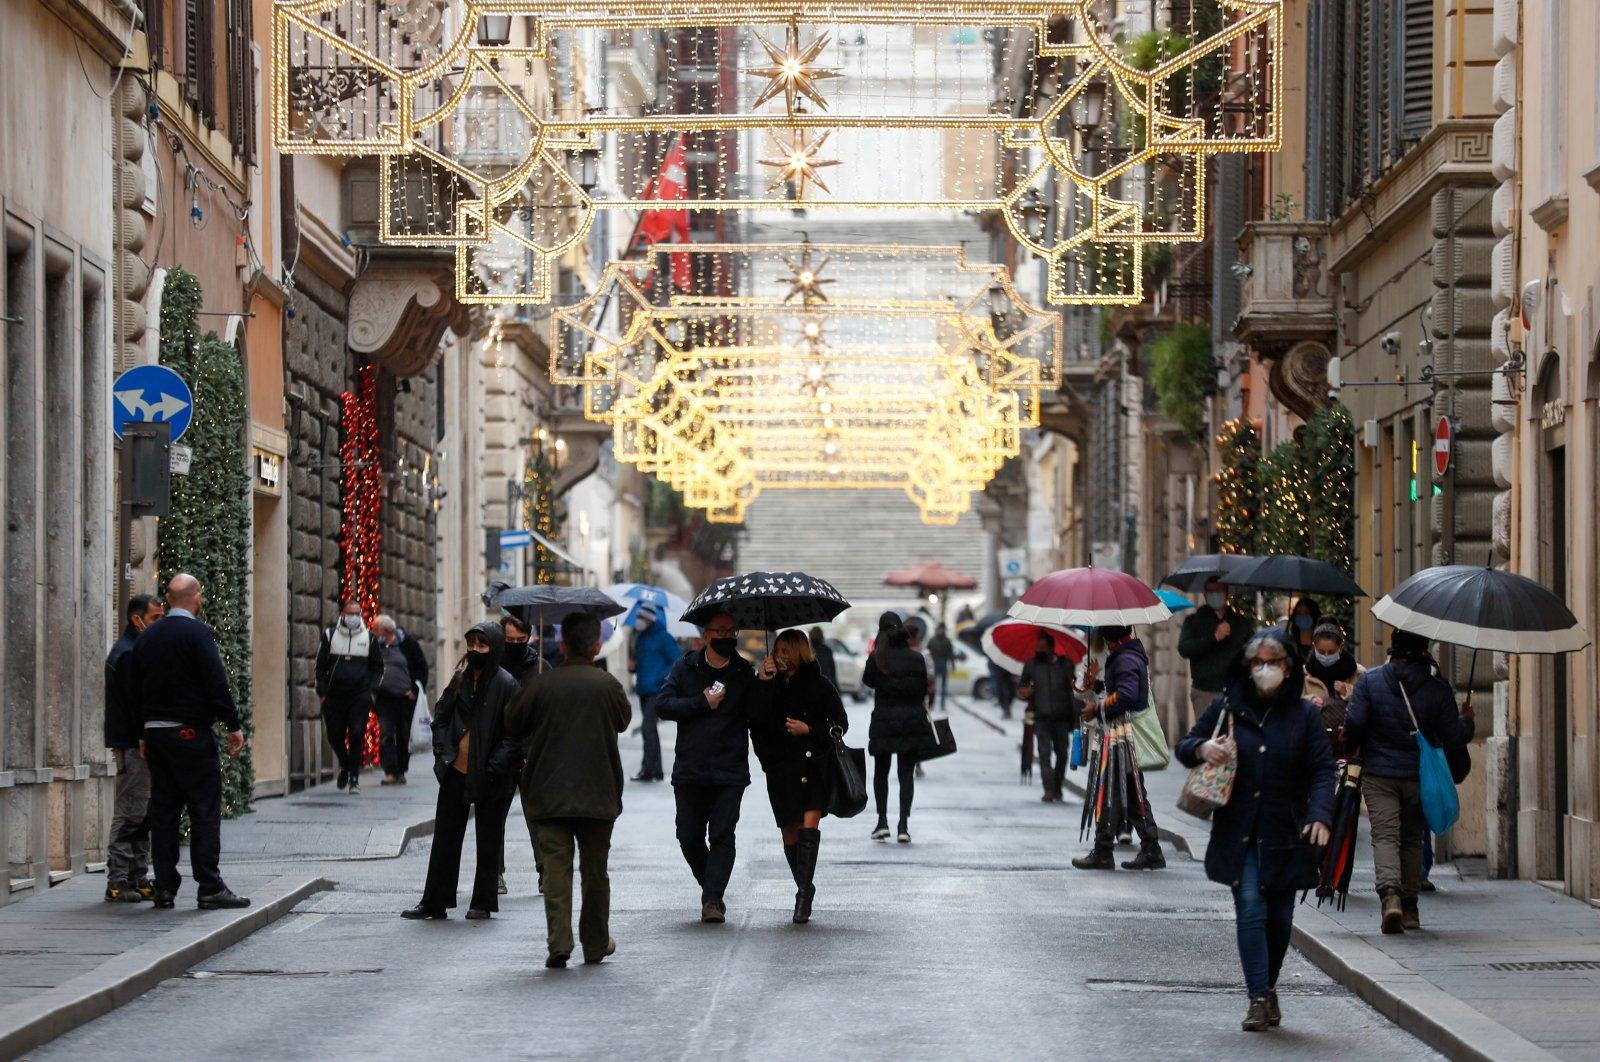 People wearing protective masks walk along Via dei Condotti street, Rome, Italy, Dec. 2, 2020. (Reuters Photo)